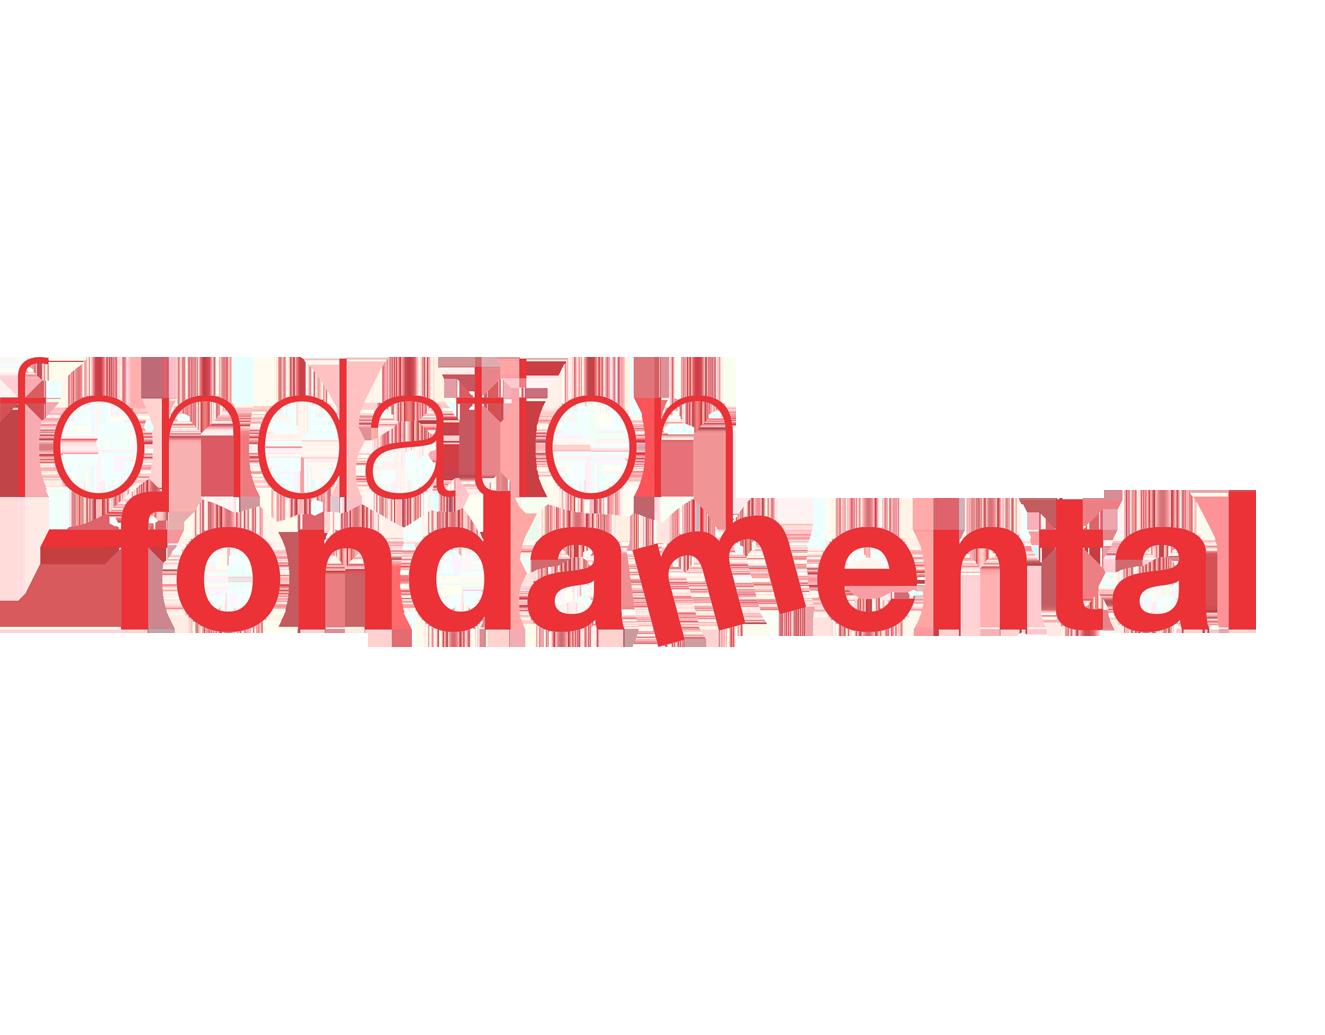 logo_psy-cohorte_ffm_HD